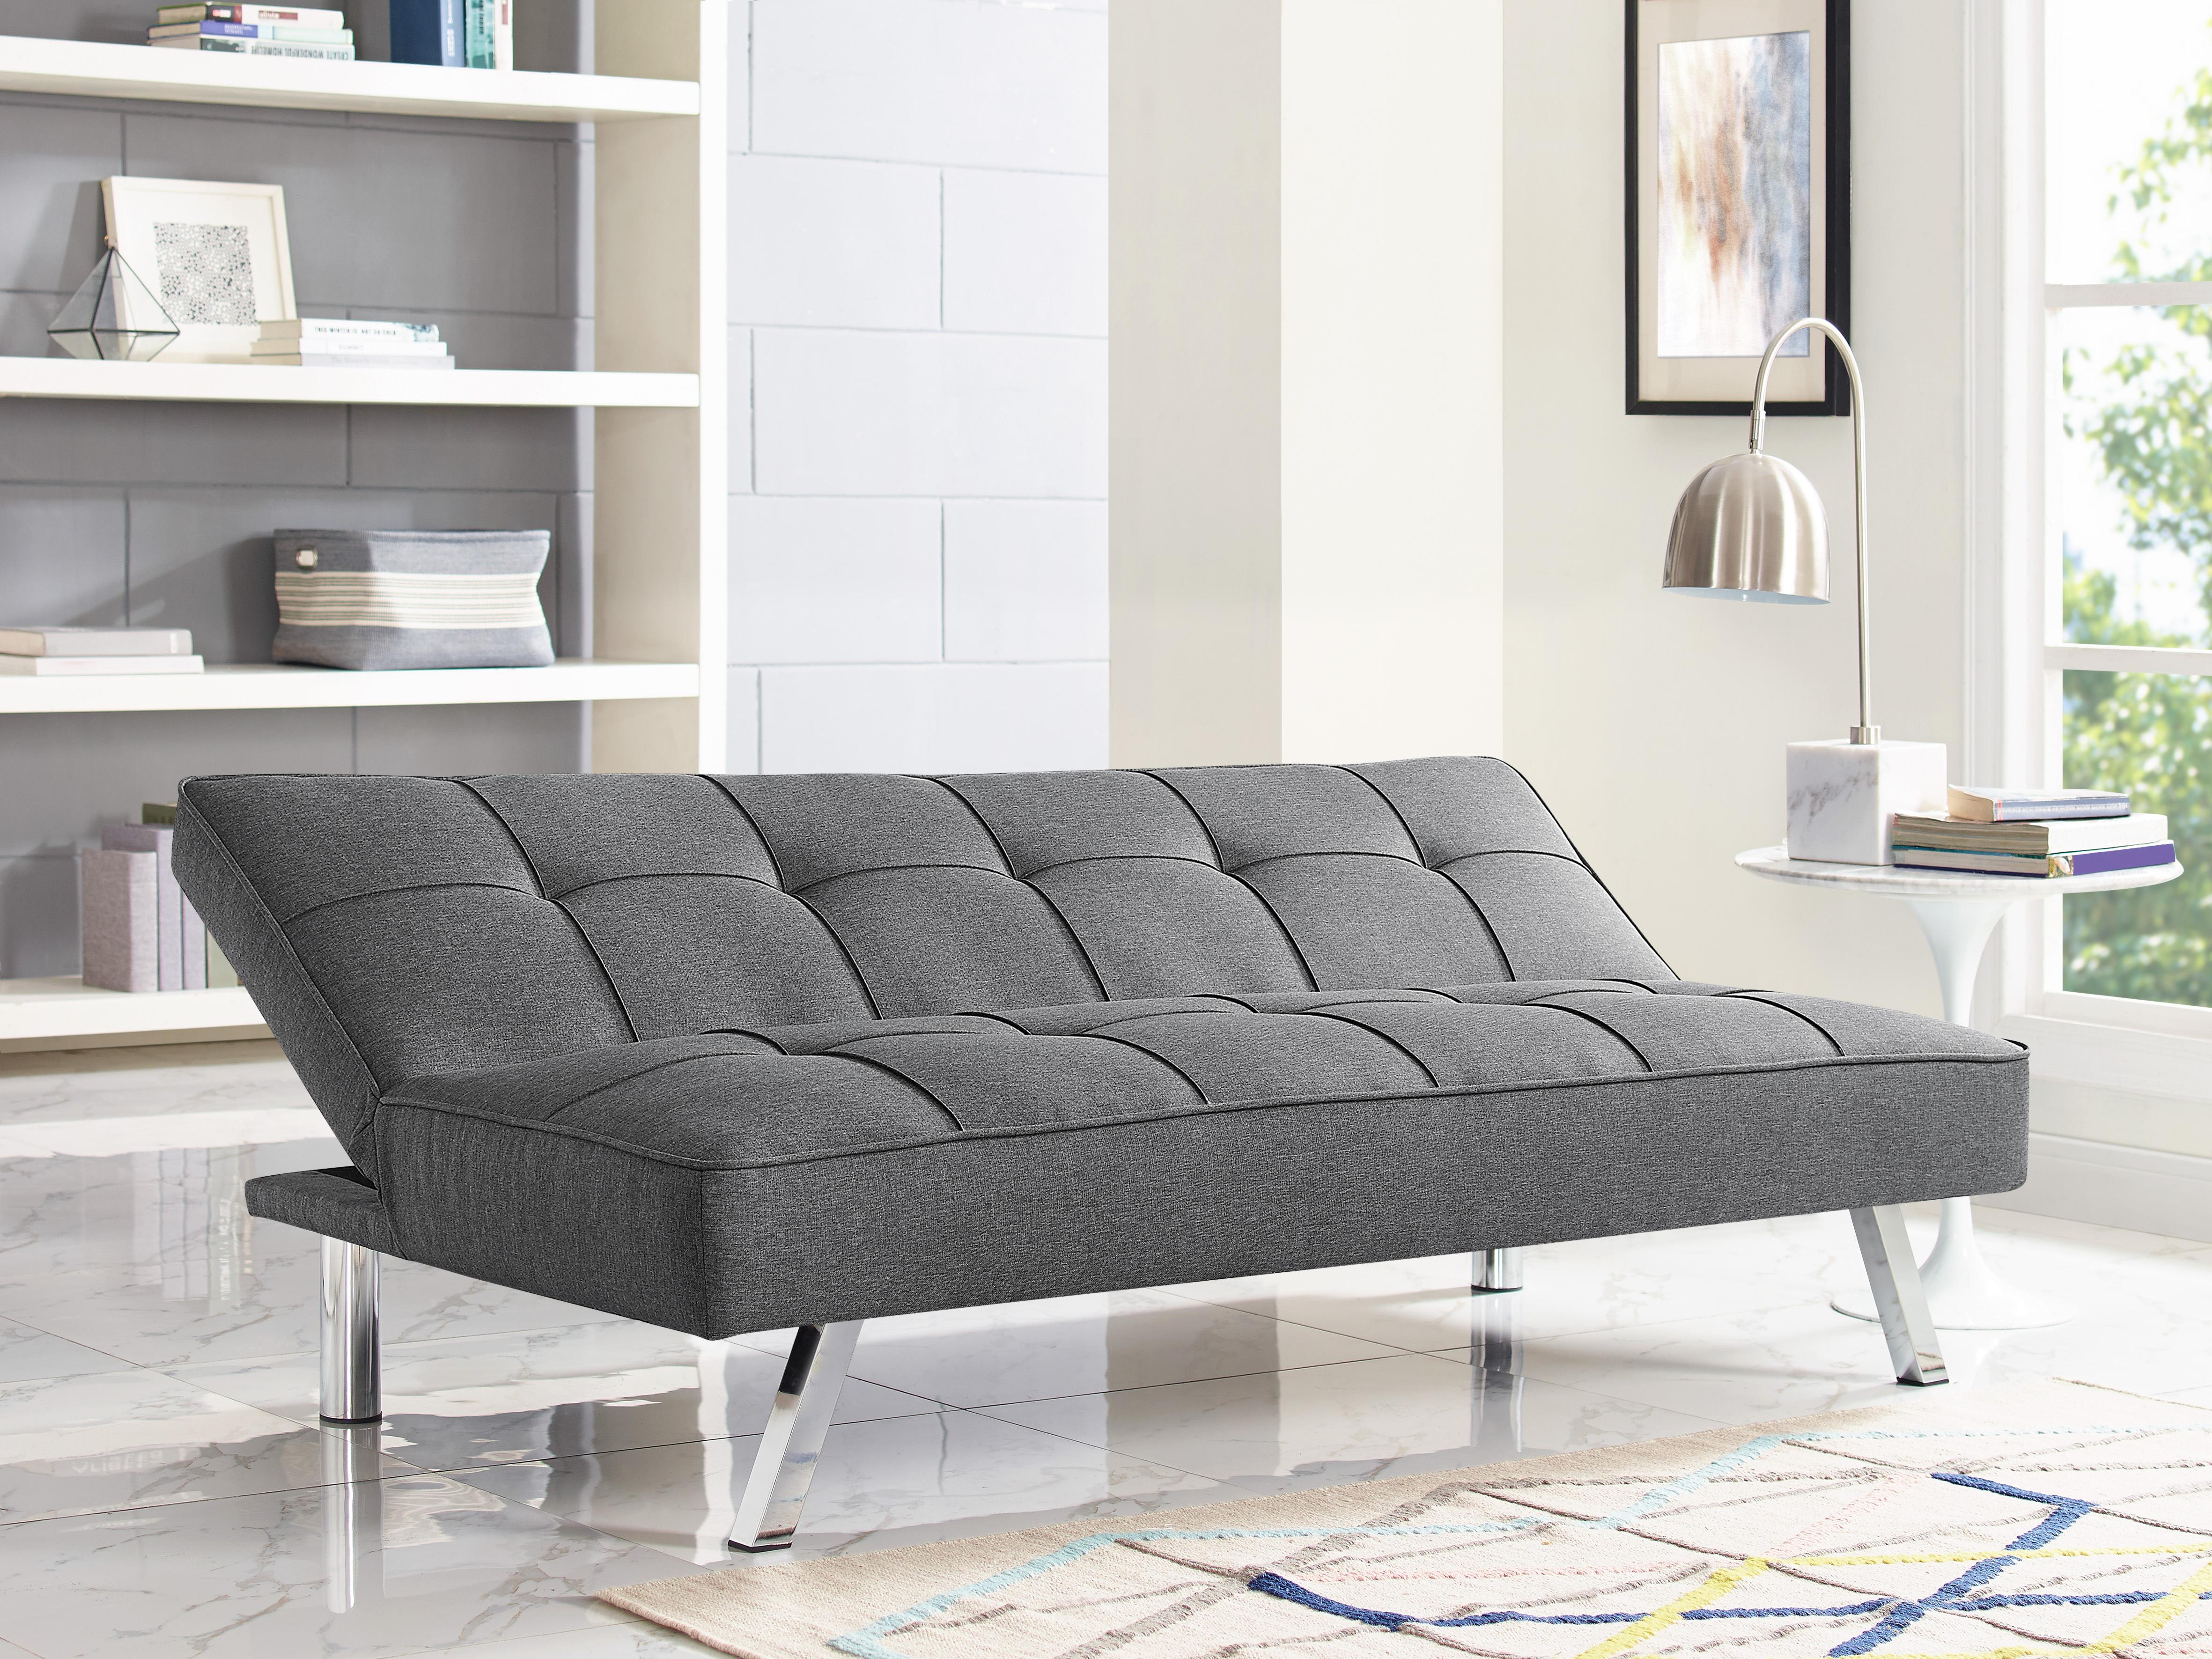 Serta Chelsea Convertible Sofa Multiple Colors 109 99 Slickdeals Net